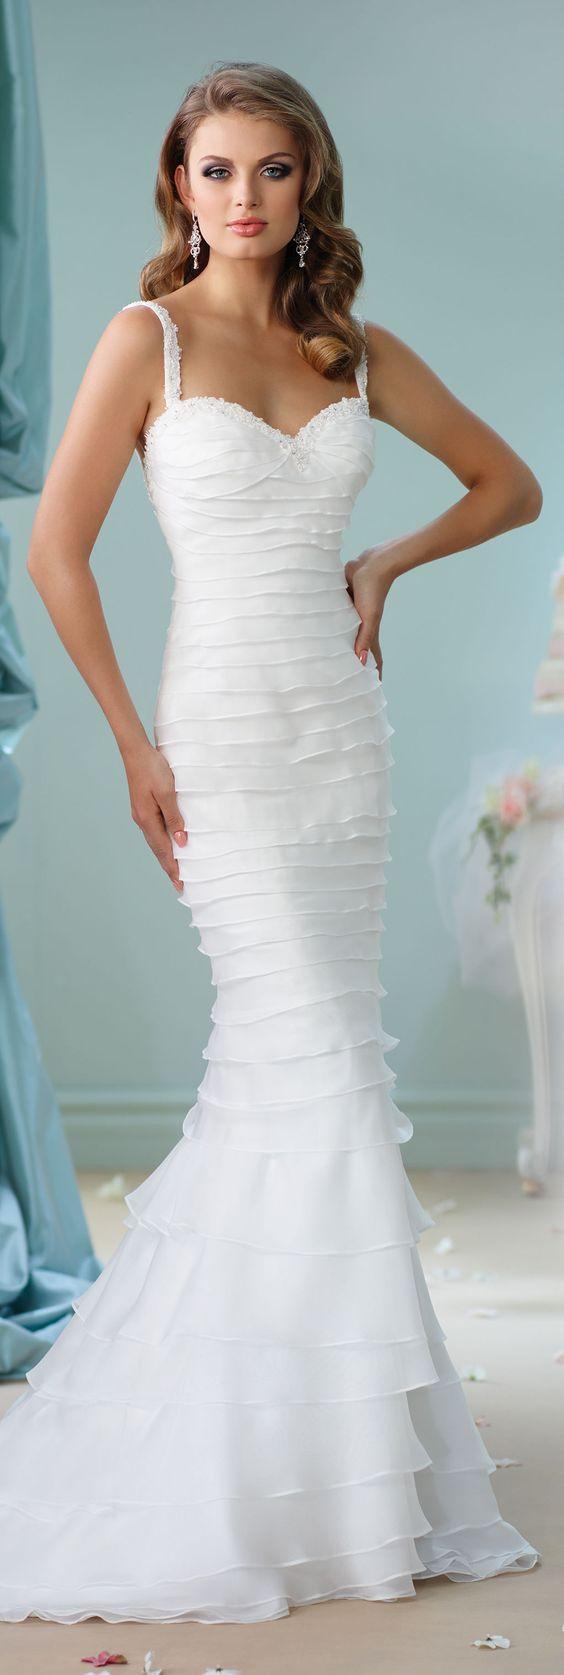 Свадьба - 116121